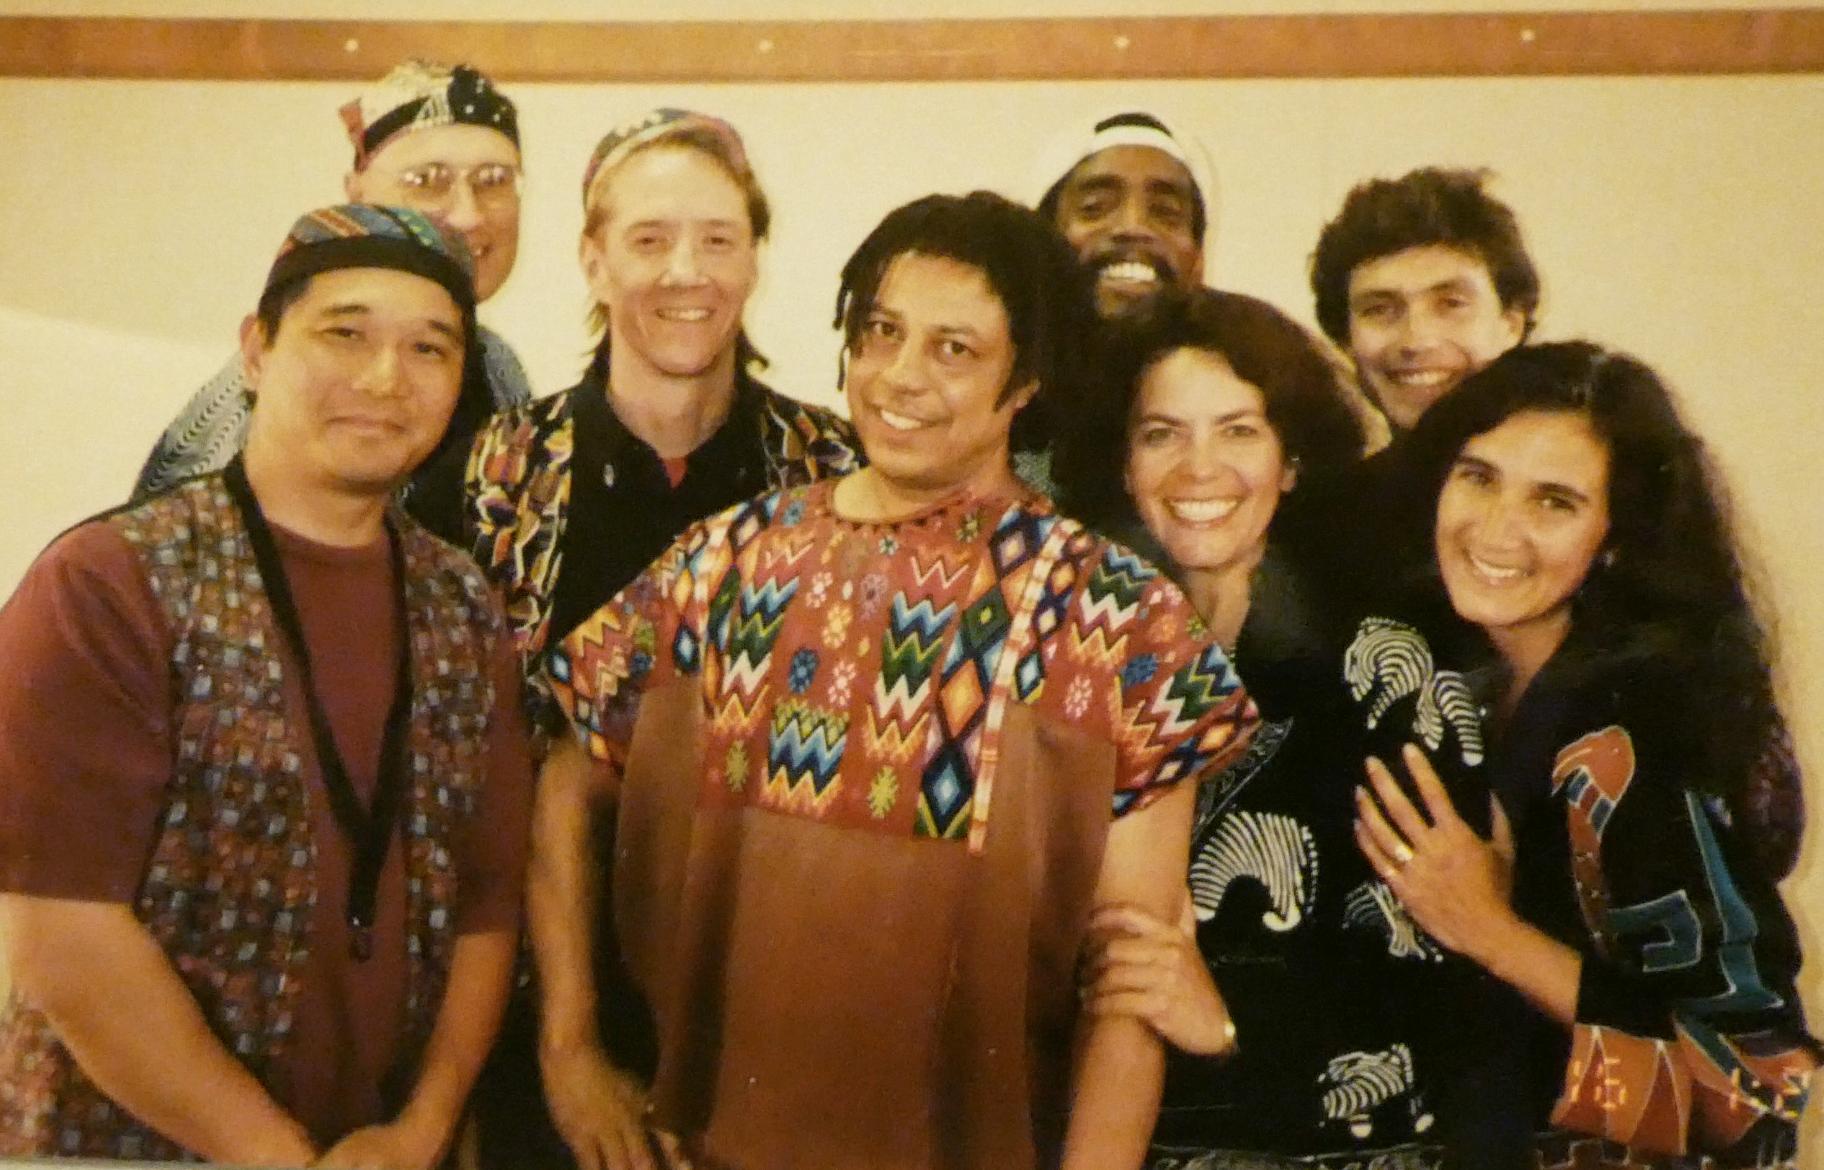 A fabulous crew of musicians for our gig at Denver's Botanic Gardens. From left, Glenn Nitta, Mark Harris, Gordon Kennedy, Chico Meira, Carlton Bacon, Rebecca Martin, Mark McCoin and Lois.